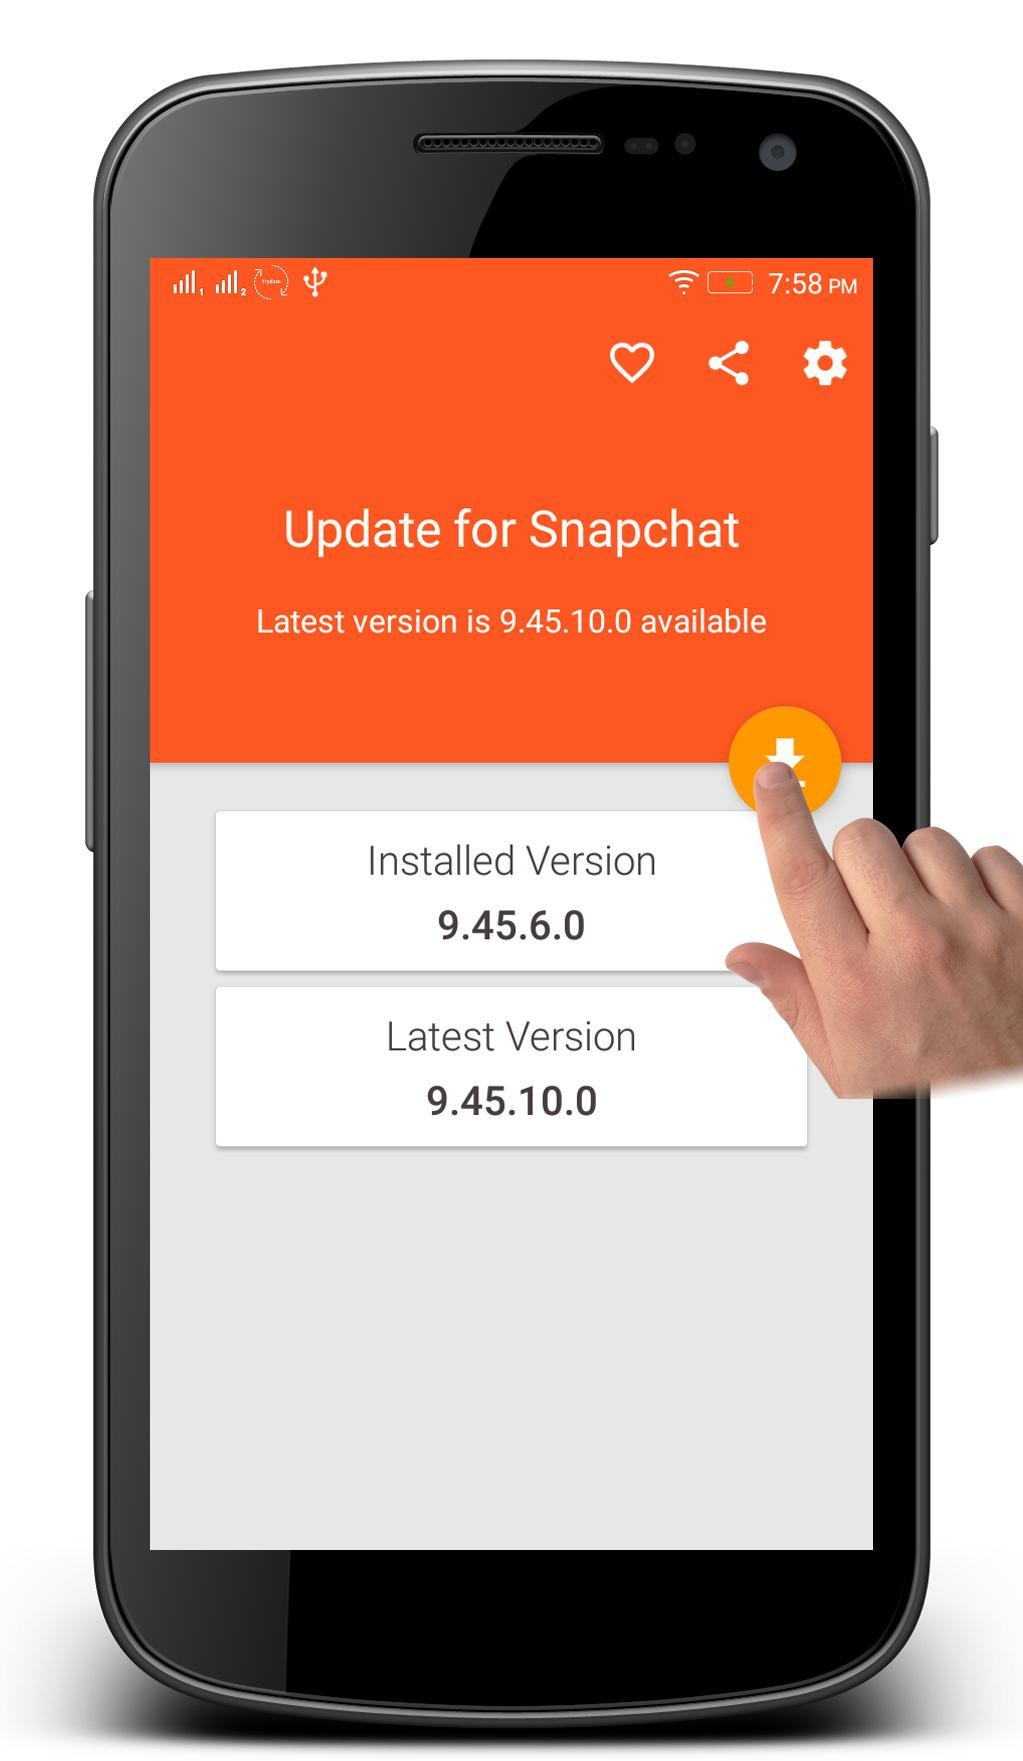 Snapchat Apk Latest Version